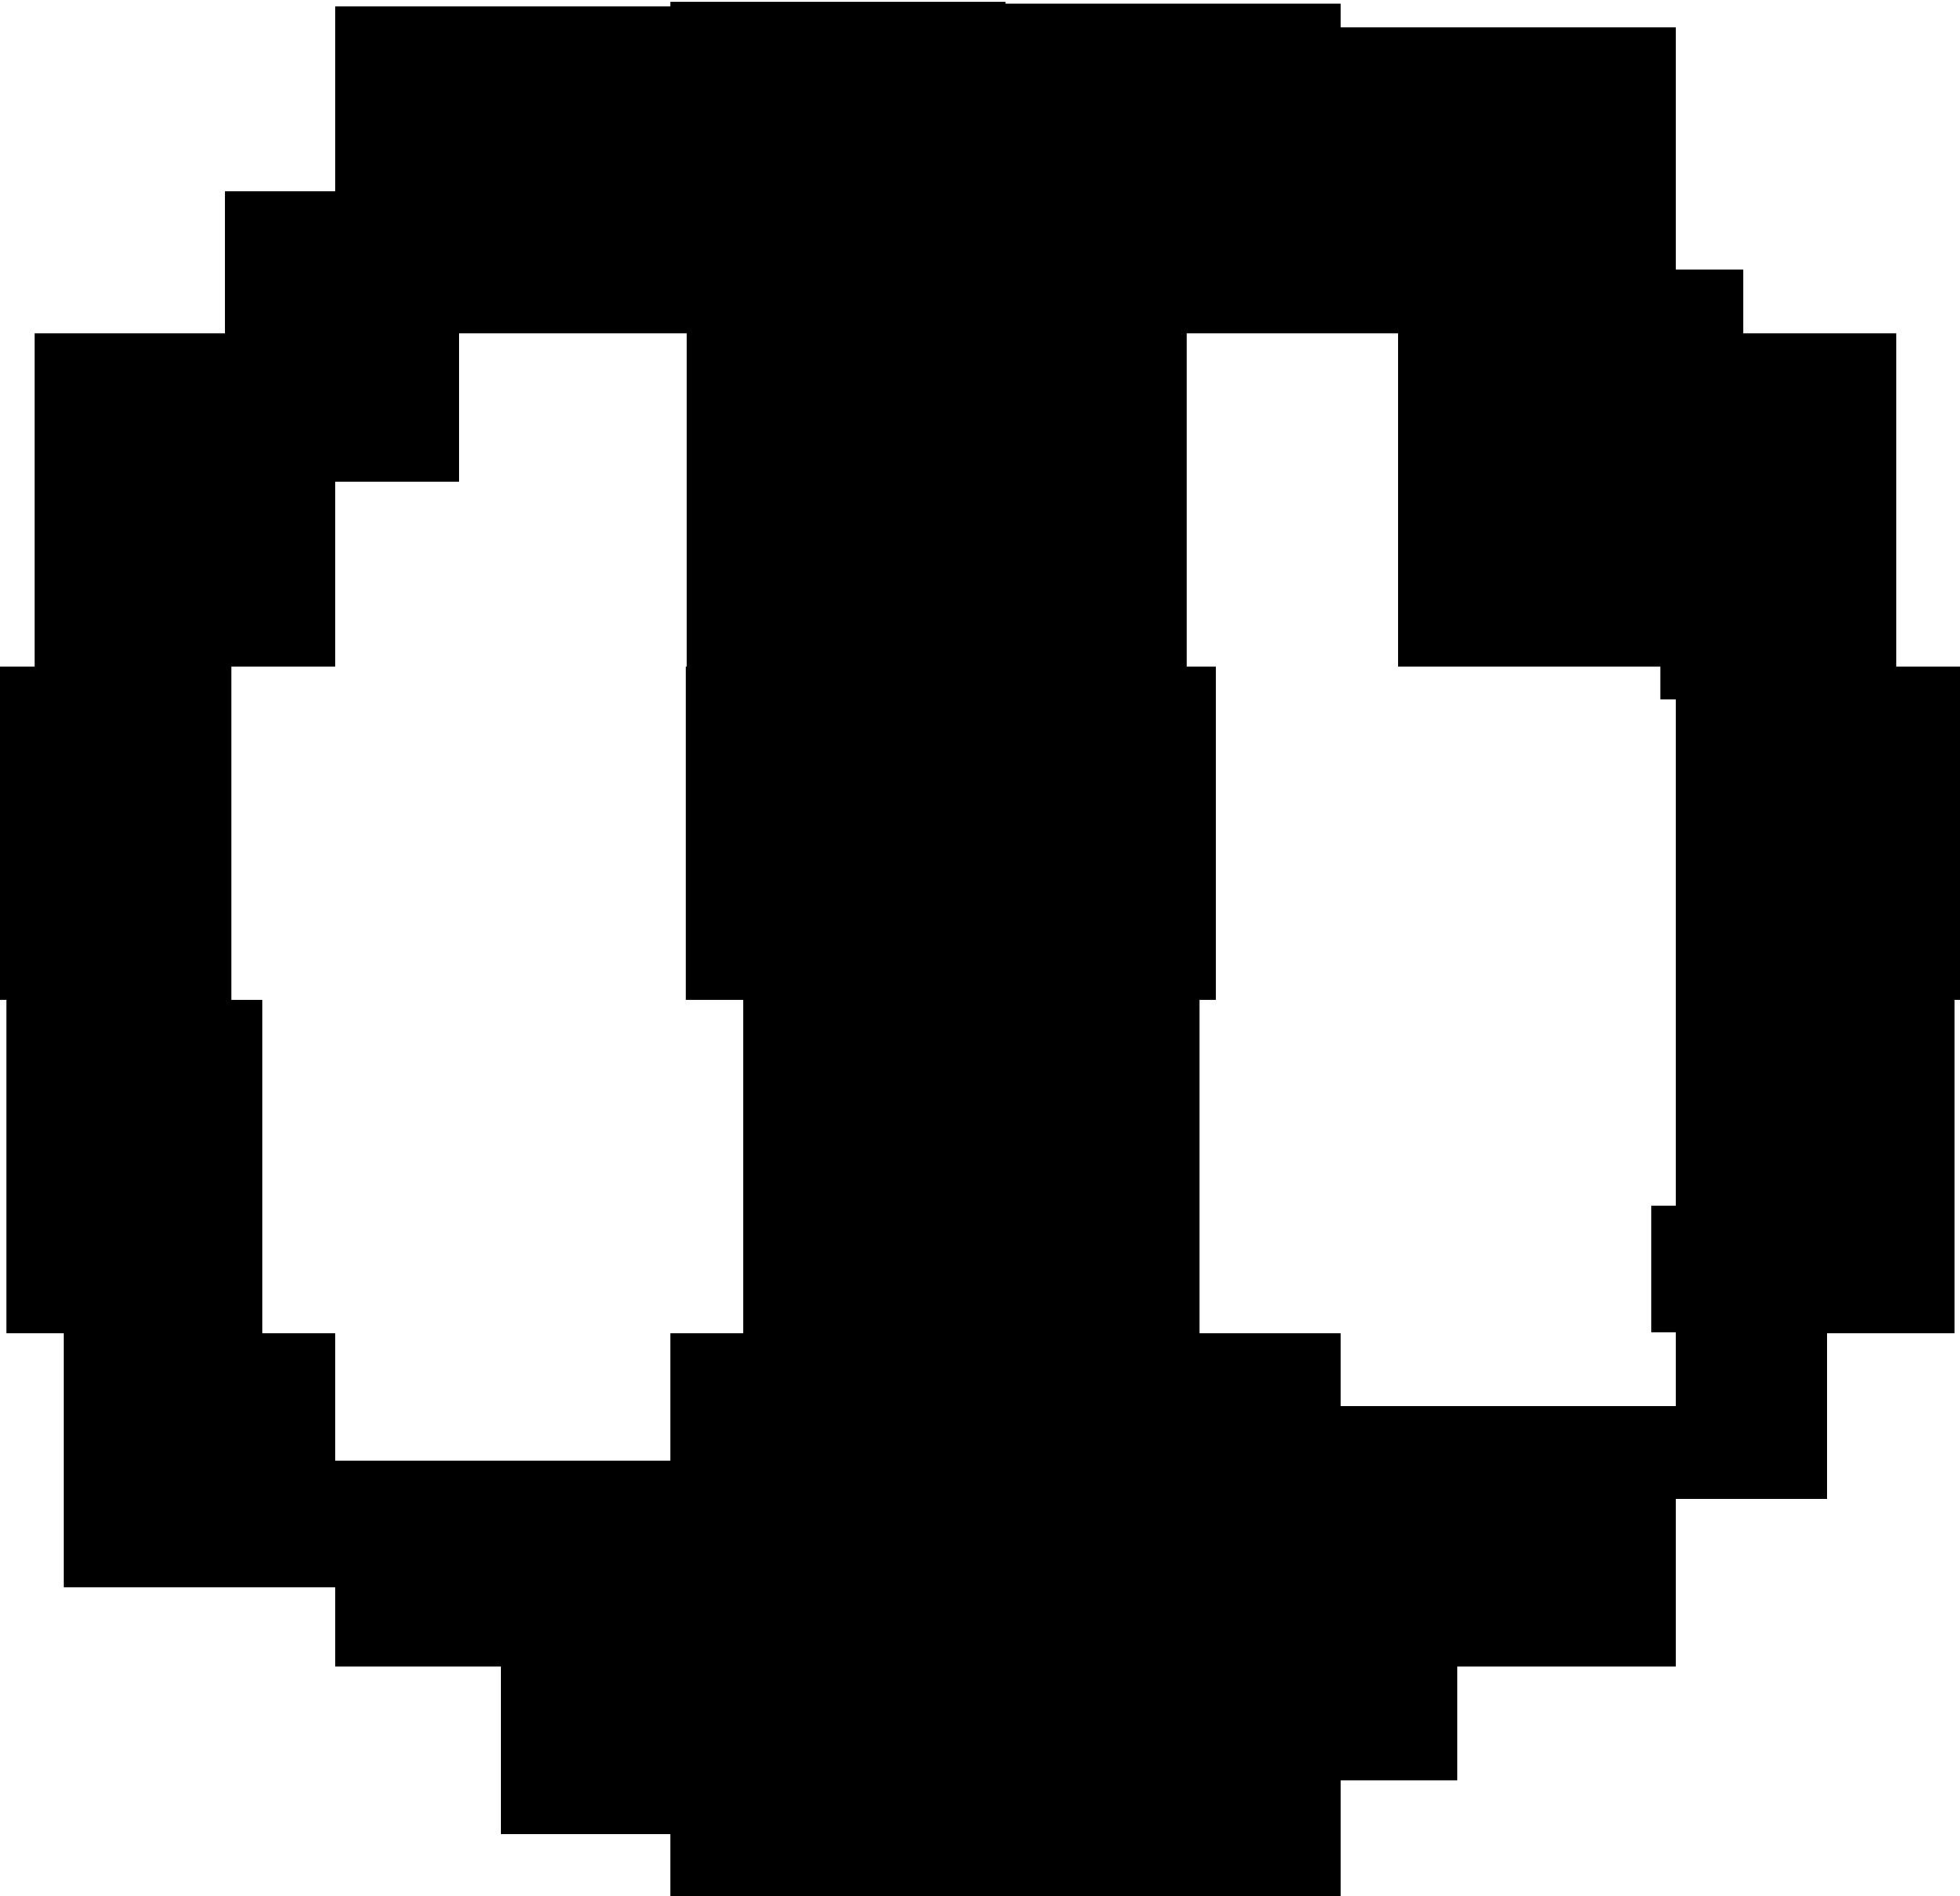 logo fder